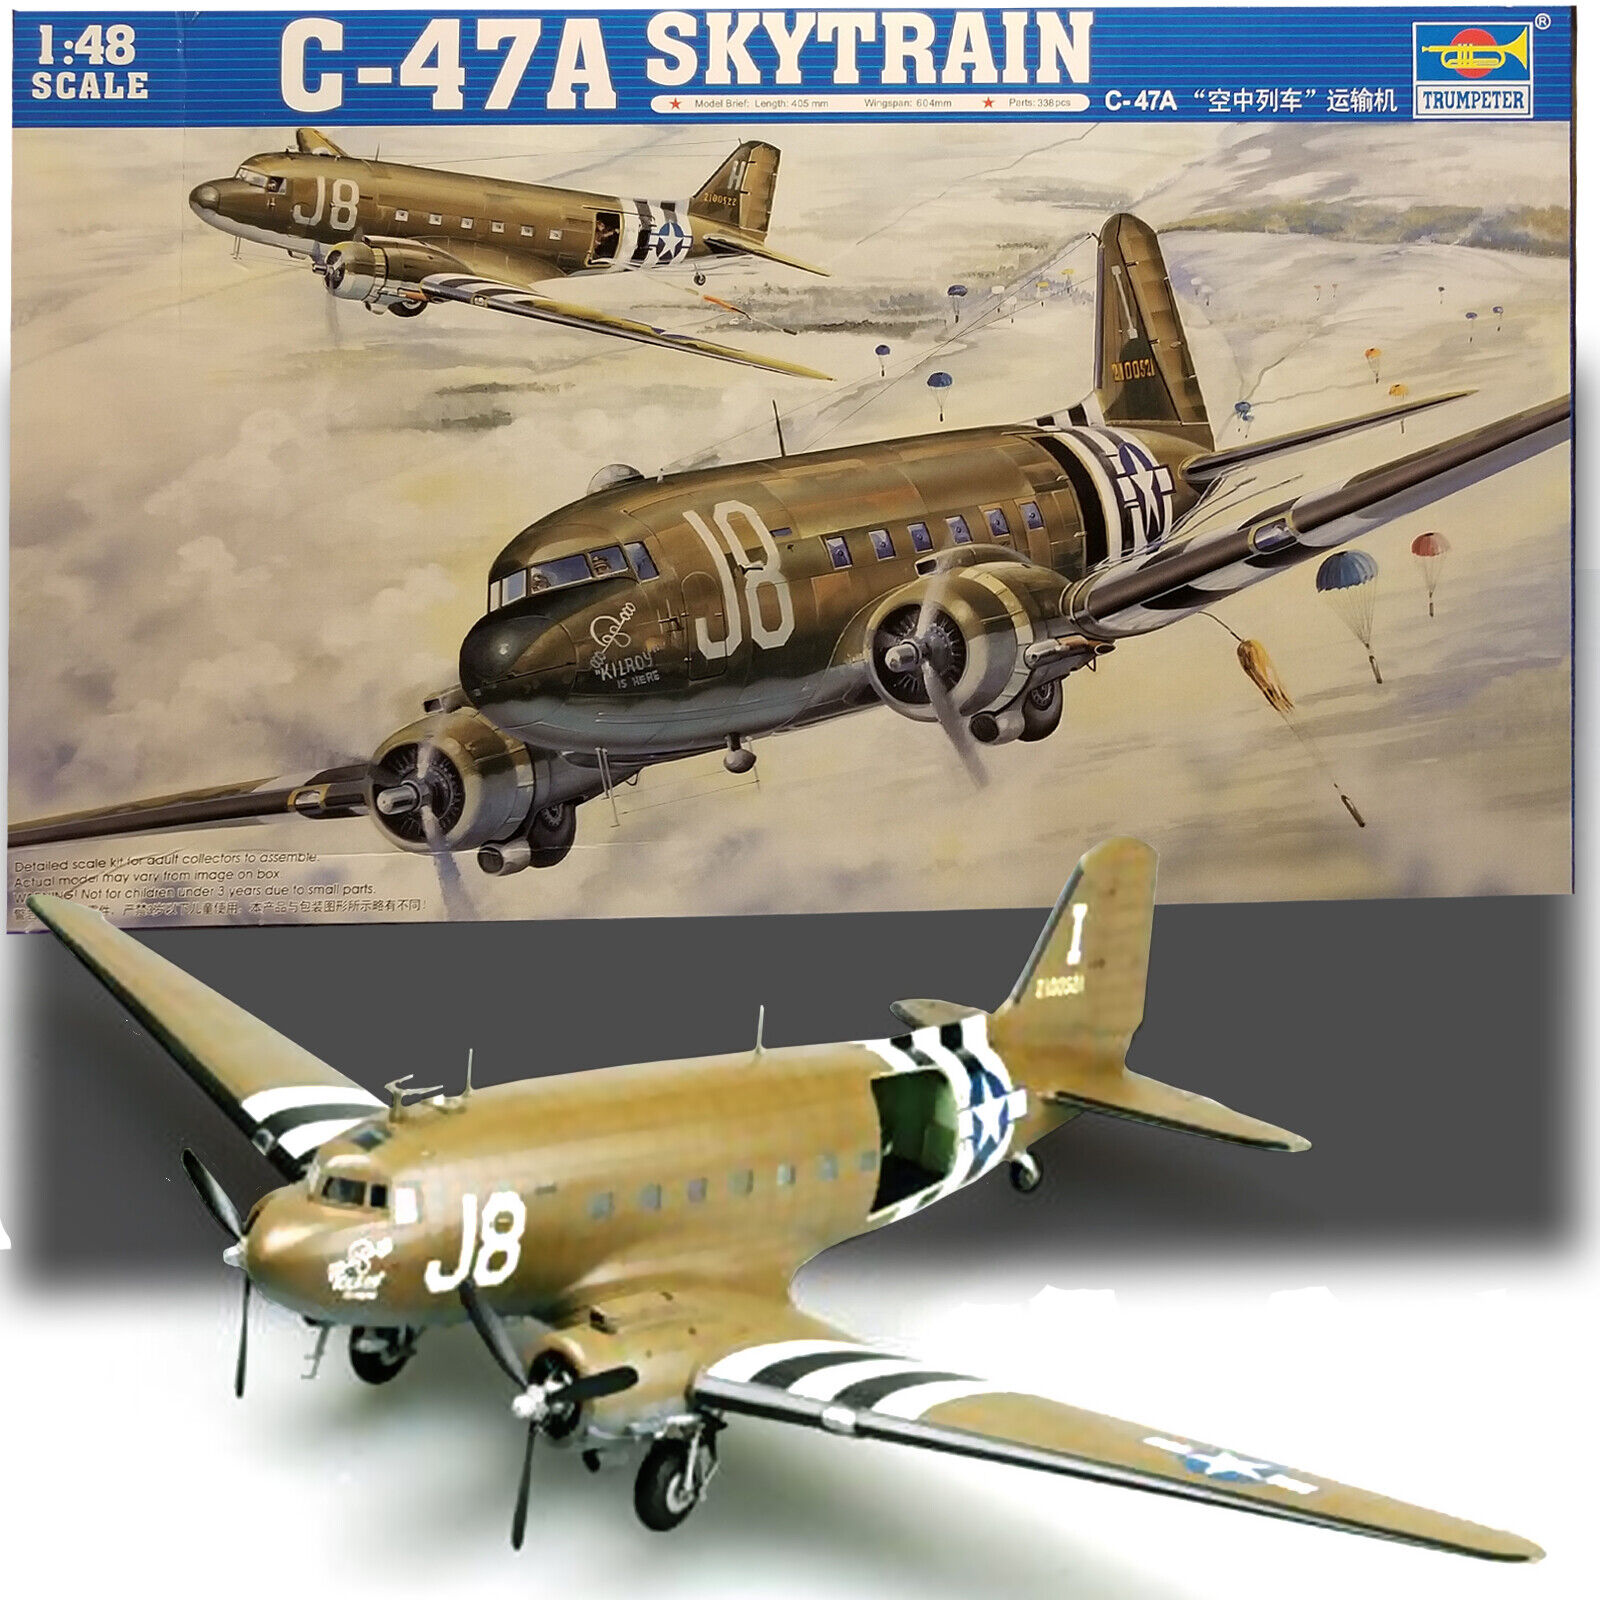 TRUMPETER 1 48 C-47A SKYTRAIN  KIT 02828